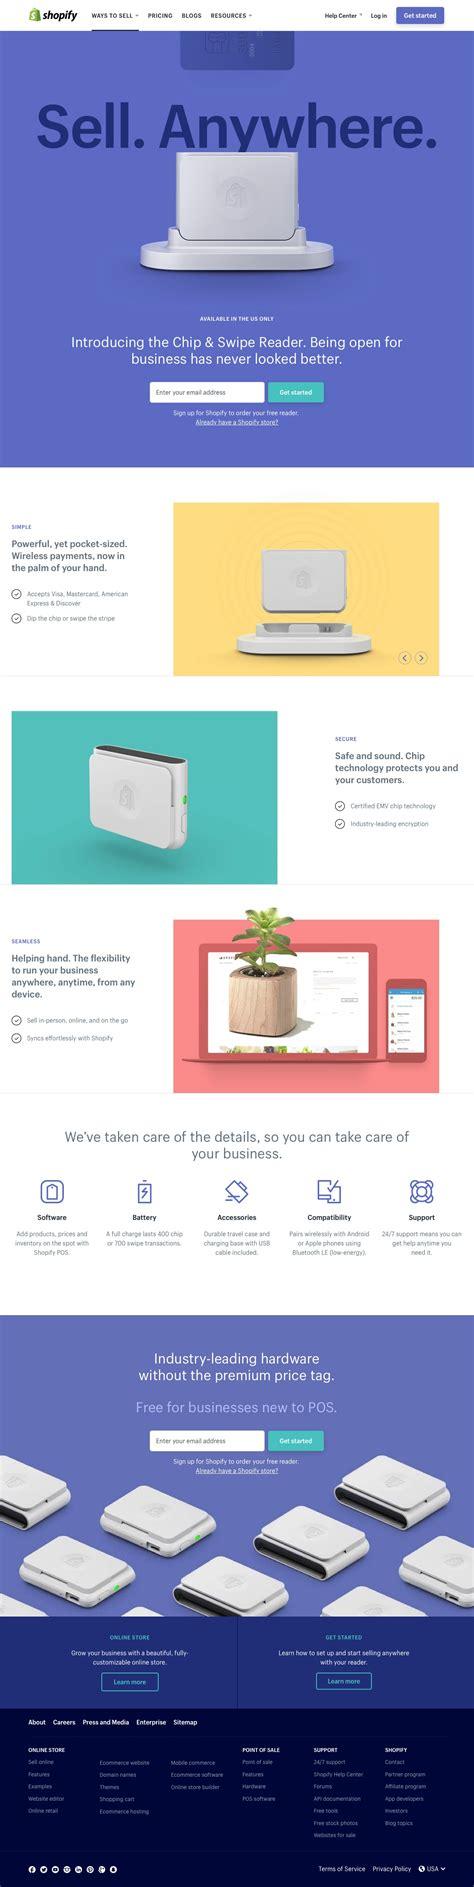 credit card reader landing page design inspiration lapa